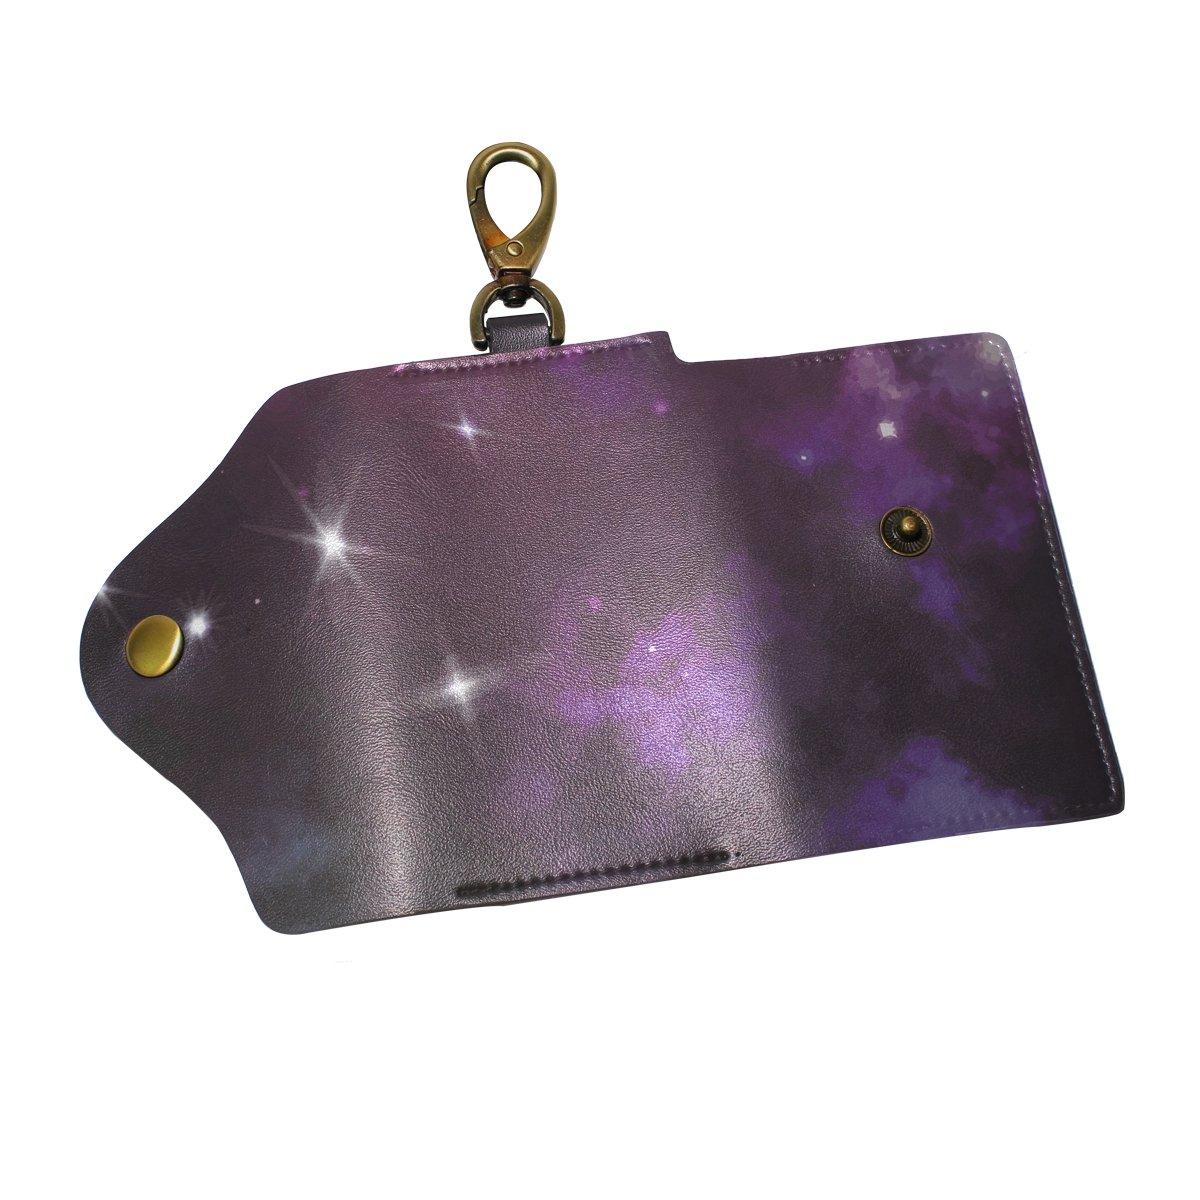 DEYYA Triangulum Galaxy Outer Space Leather Key Case Wallets Unisex Keychain Key Holder with 6 Hooks Snap Closure